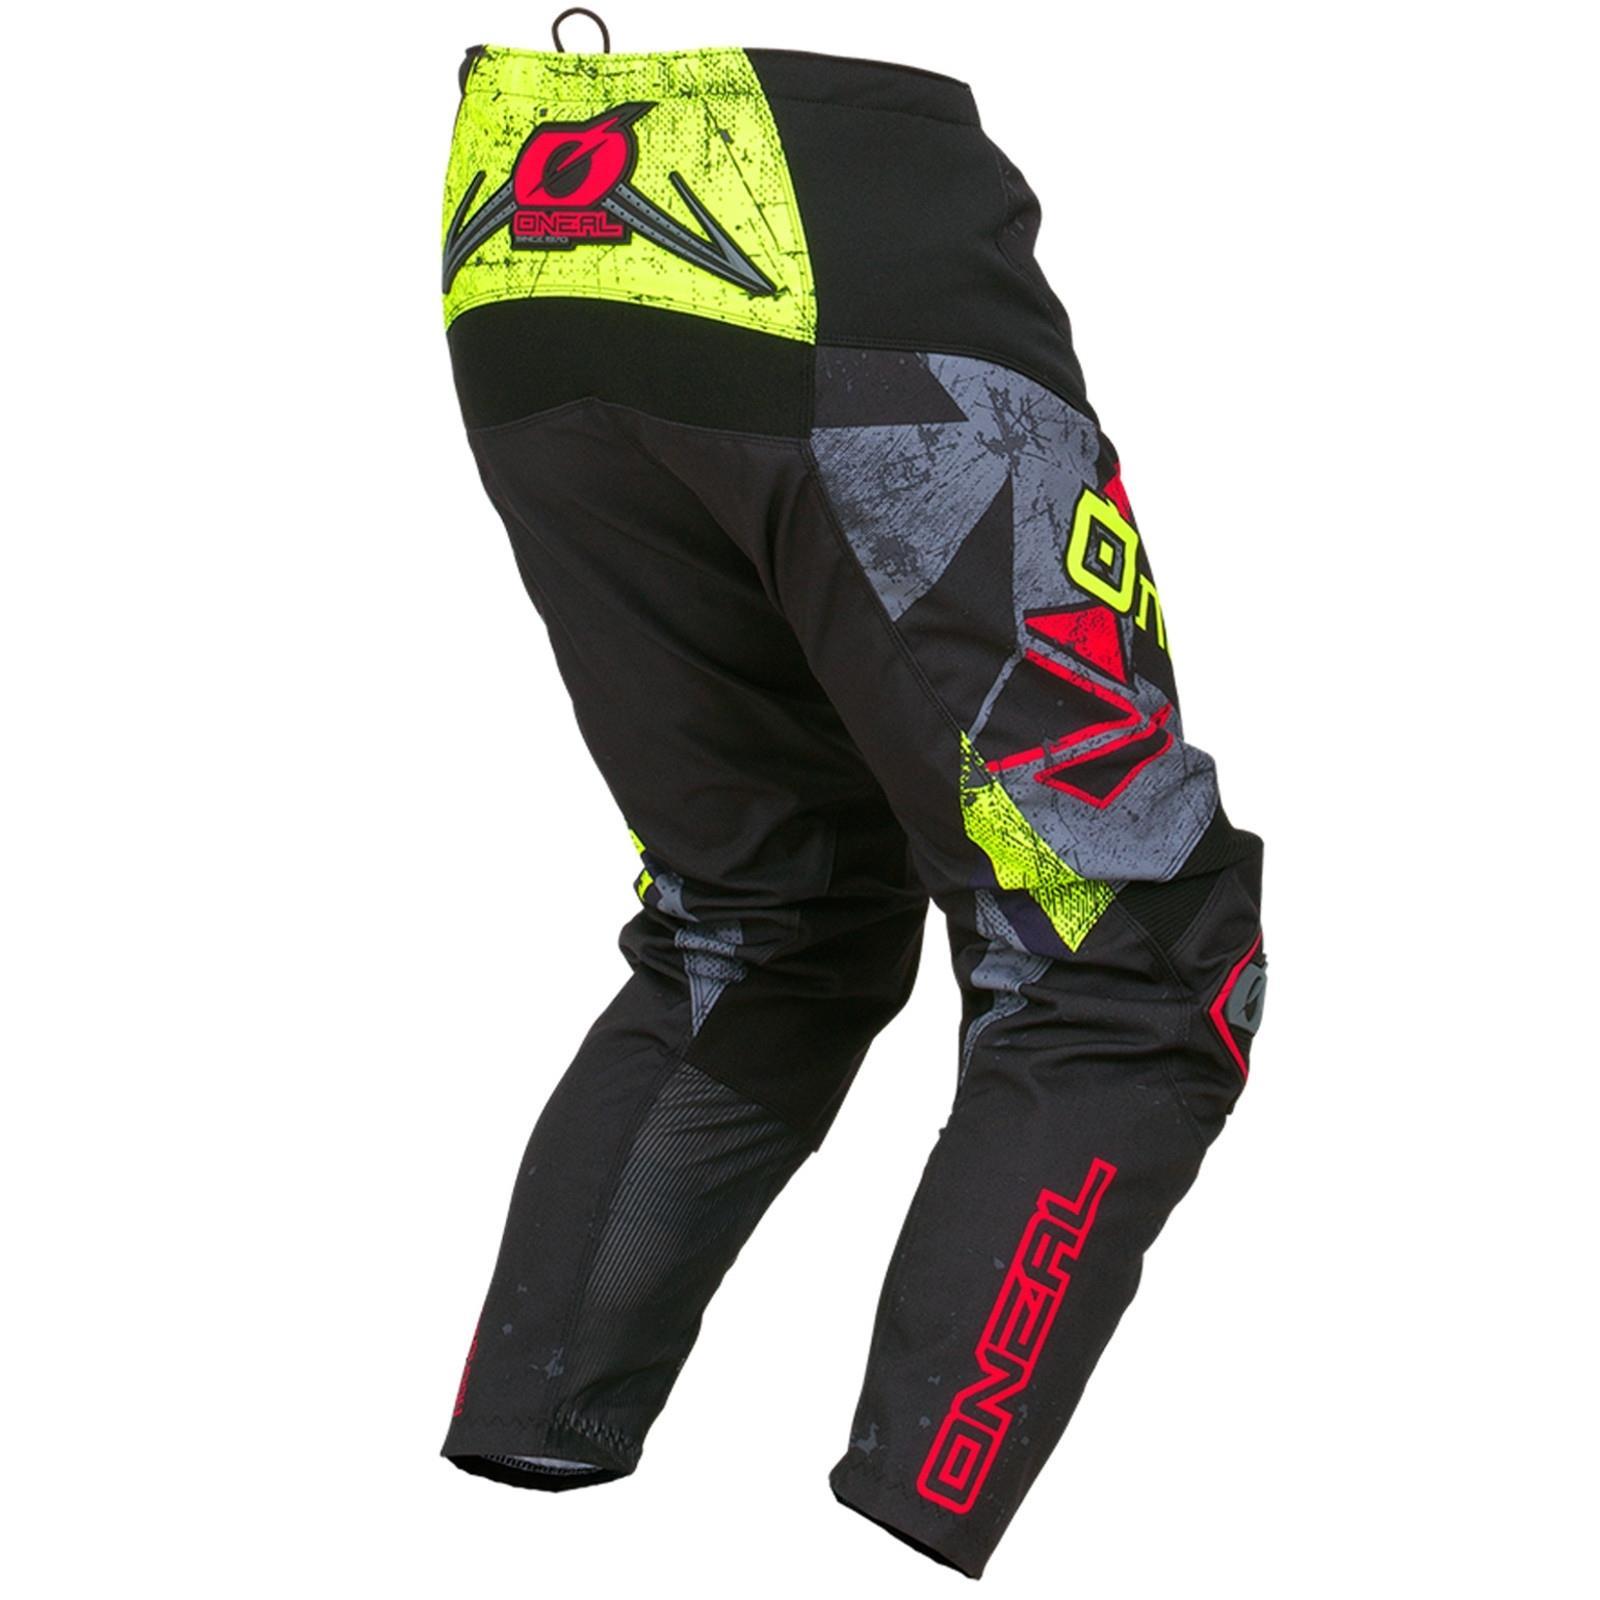 Oneal-elemento-Mayhem-Hardwear-Pants-pantalones-MX-DH-FR-Moto-Cross-Enduro-MTB-moto miniatura 39